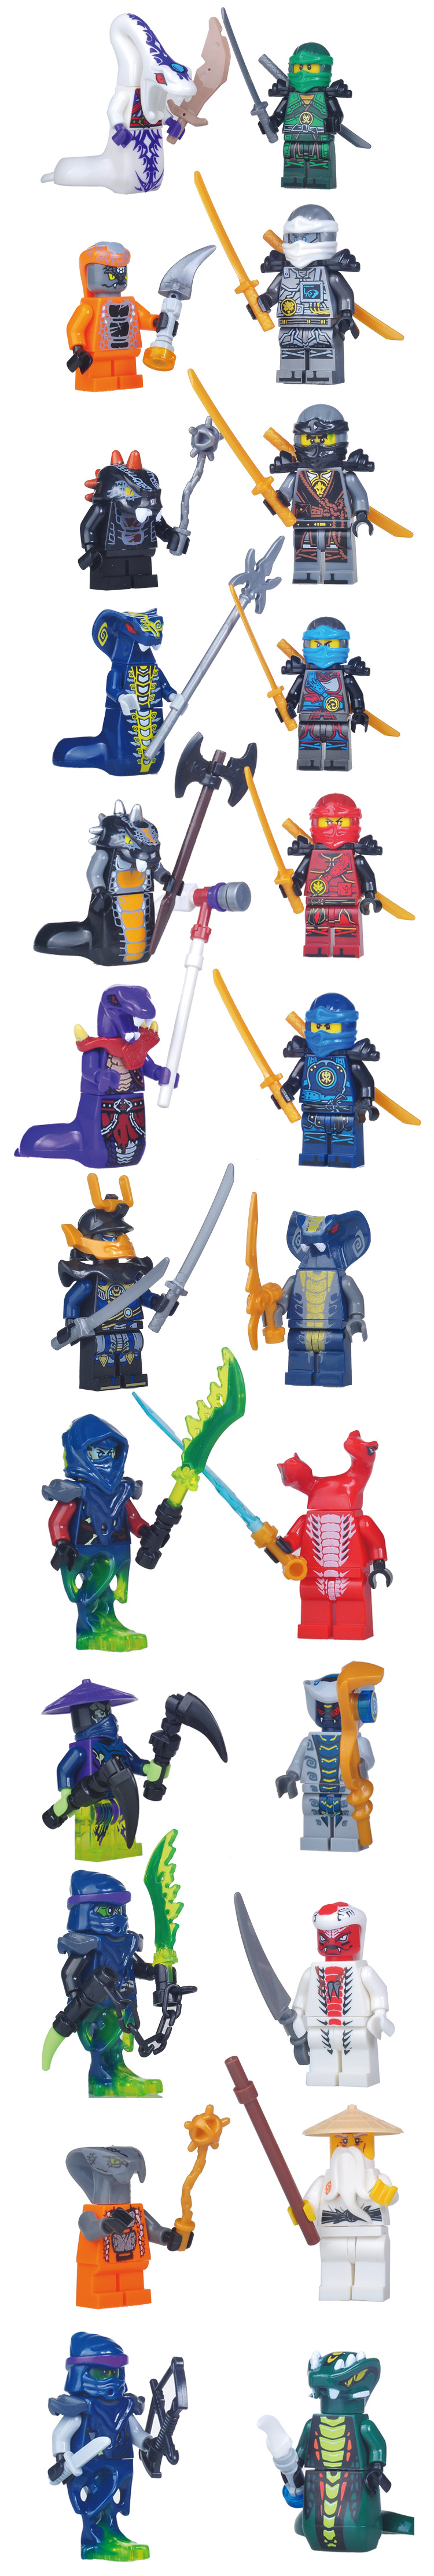 Lego Ninjago Set Kai Jay Cole Zane Nya Lloyd